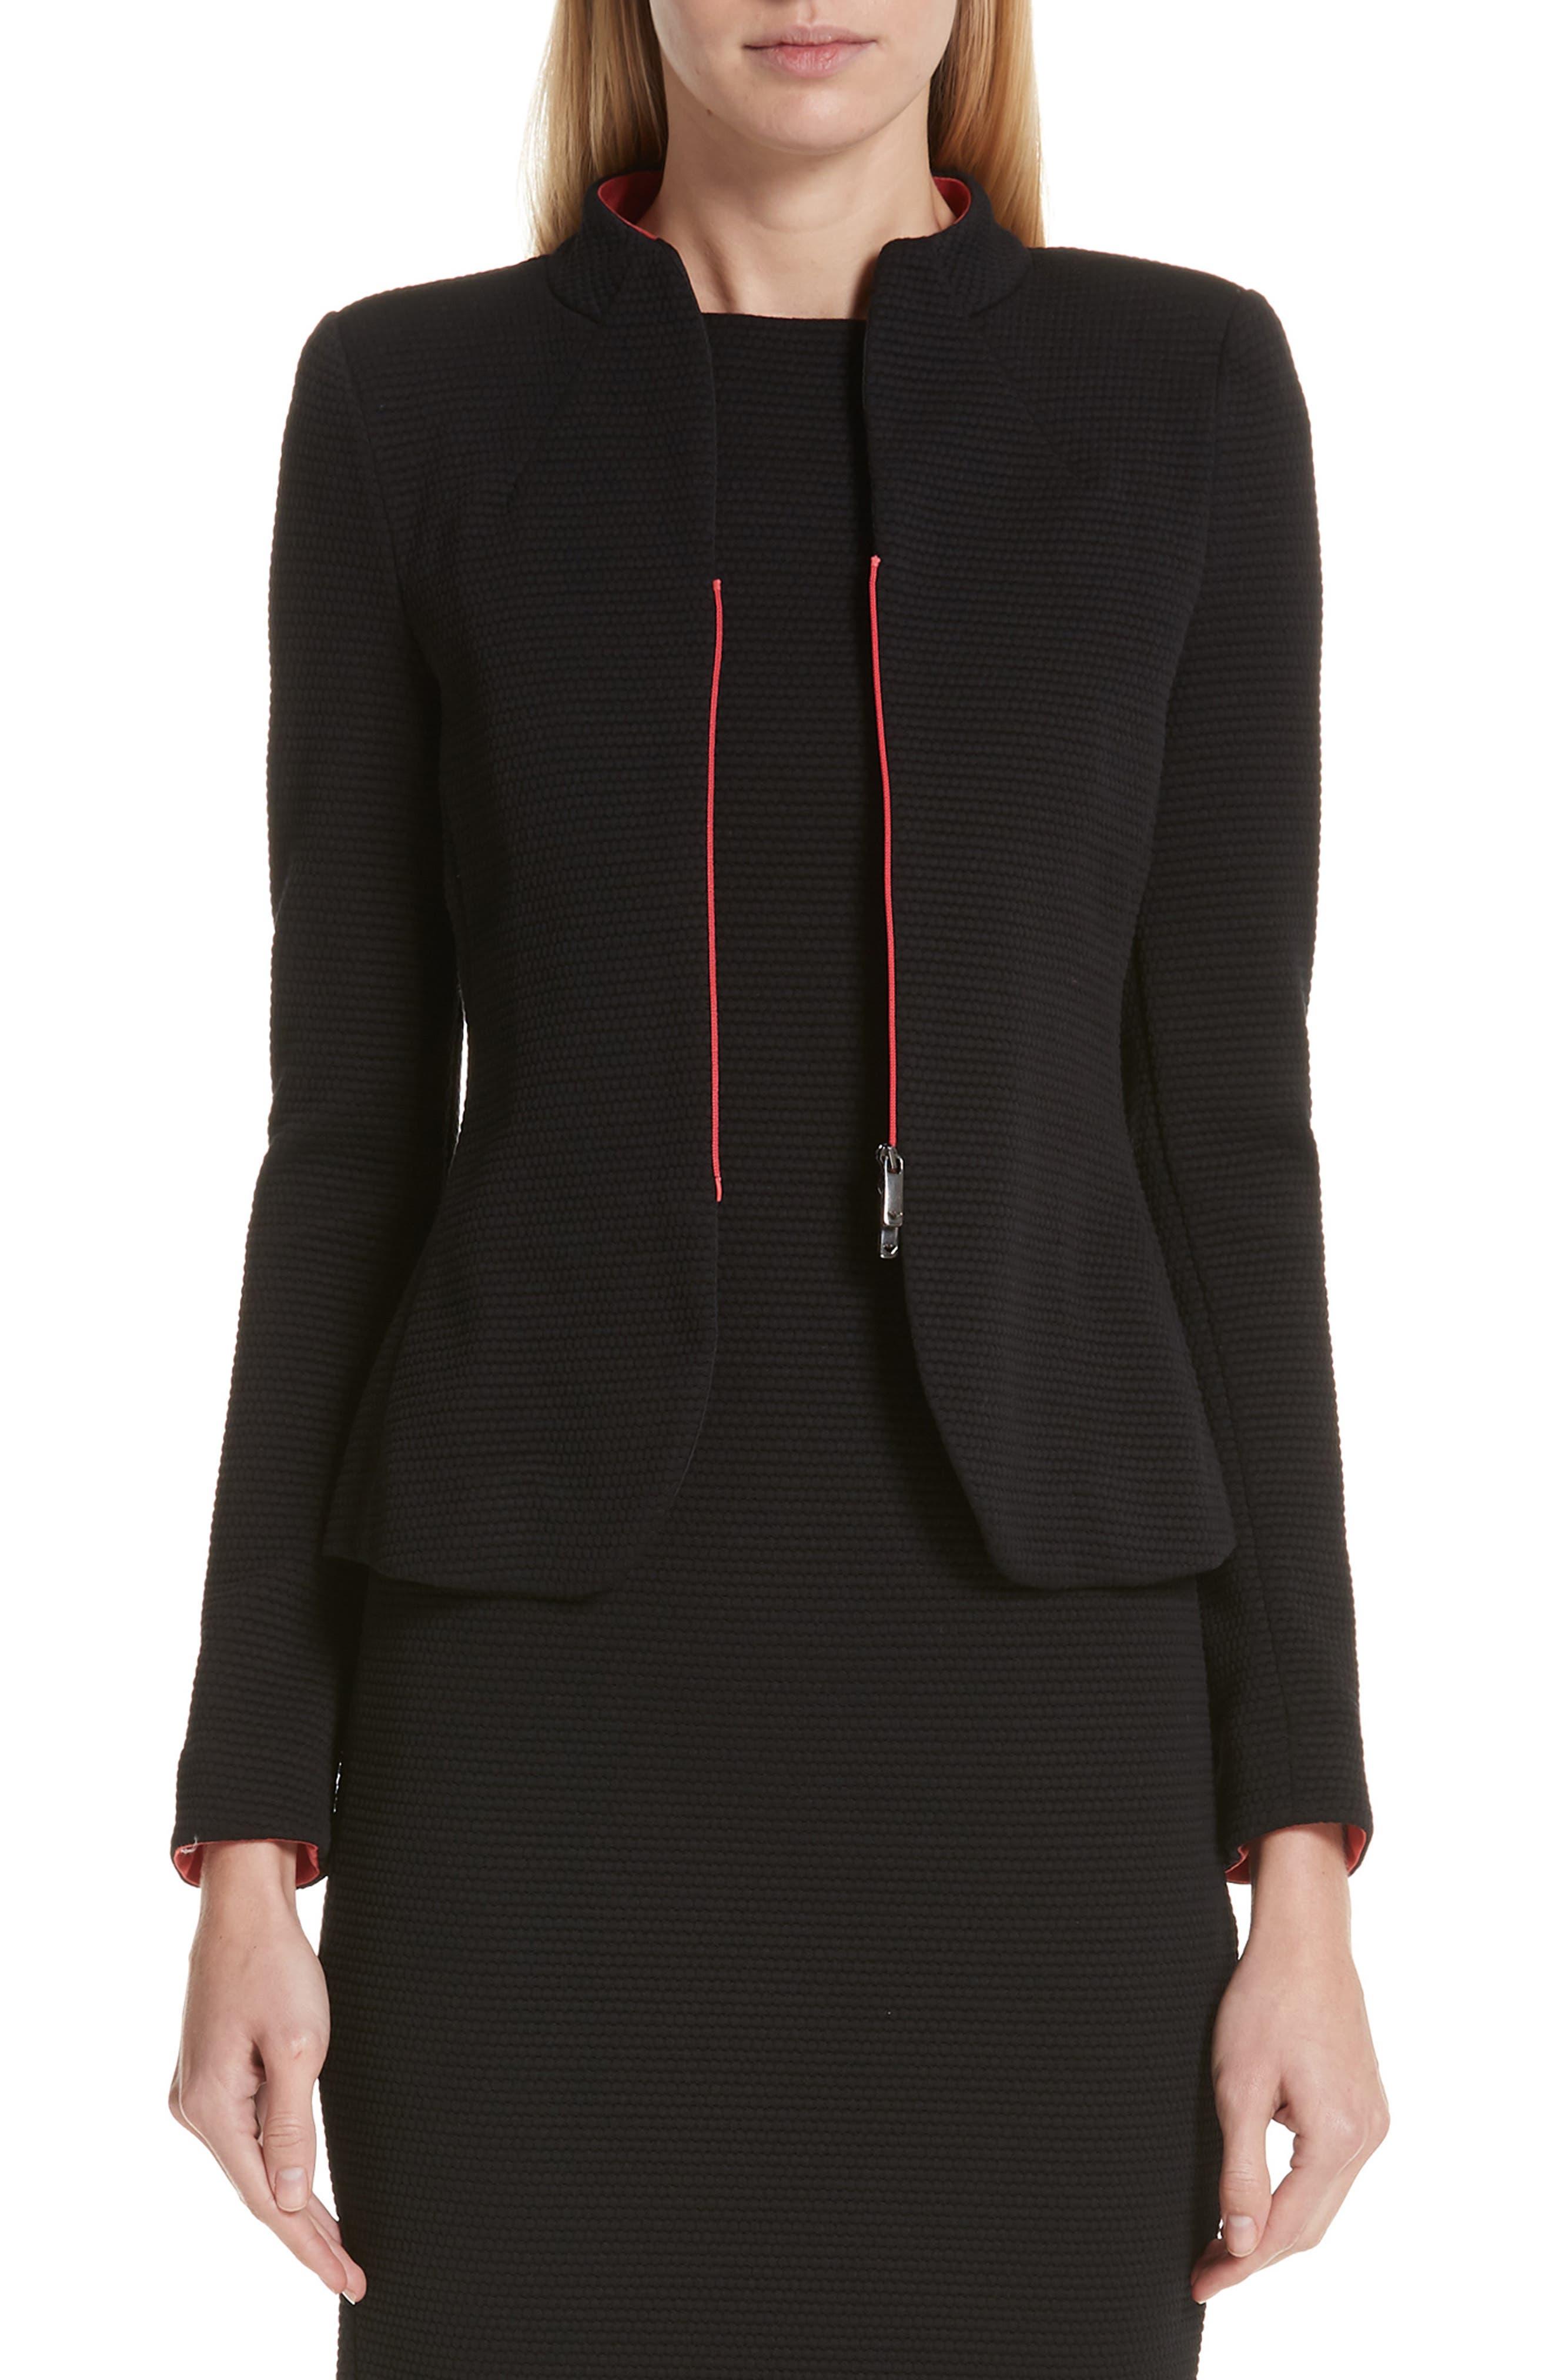 EMPORIO ARMANI Zip-Front Textured Jersey Jacket in Black